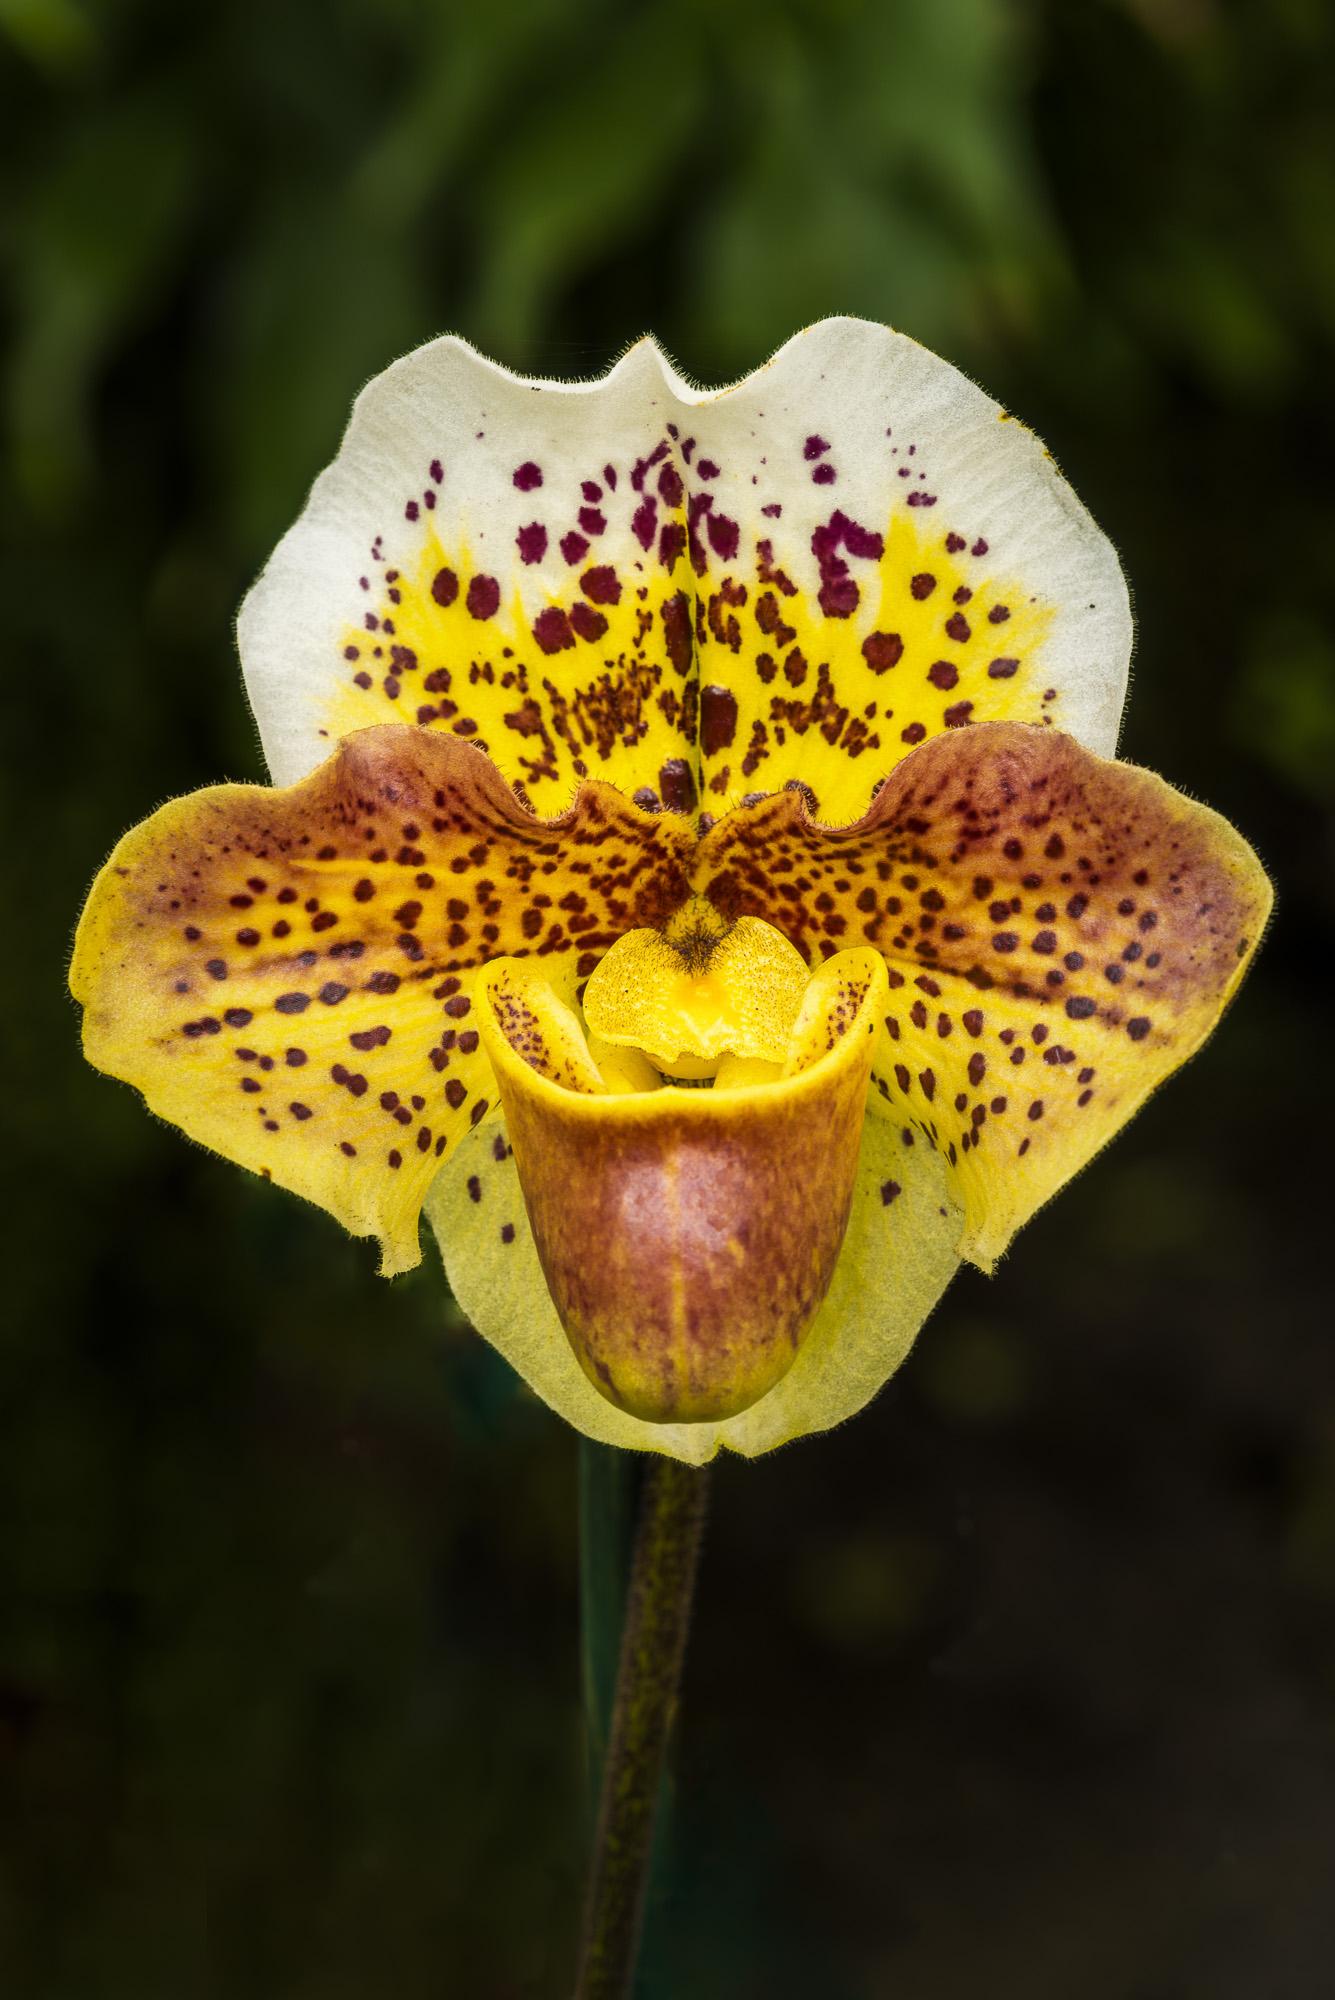 Orchid, LA Arboretum, Los Angeles, California, USA